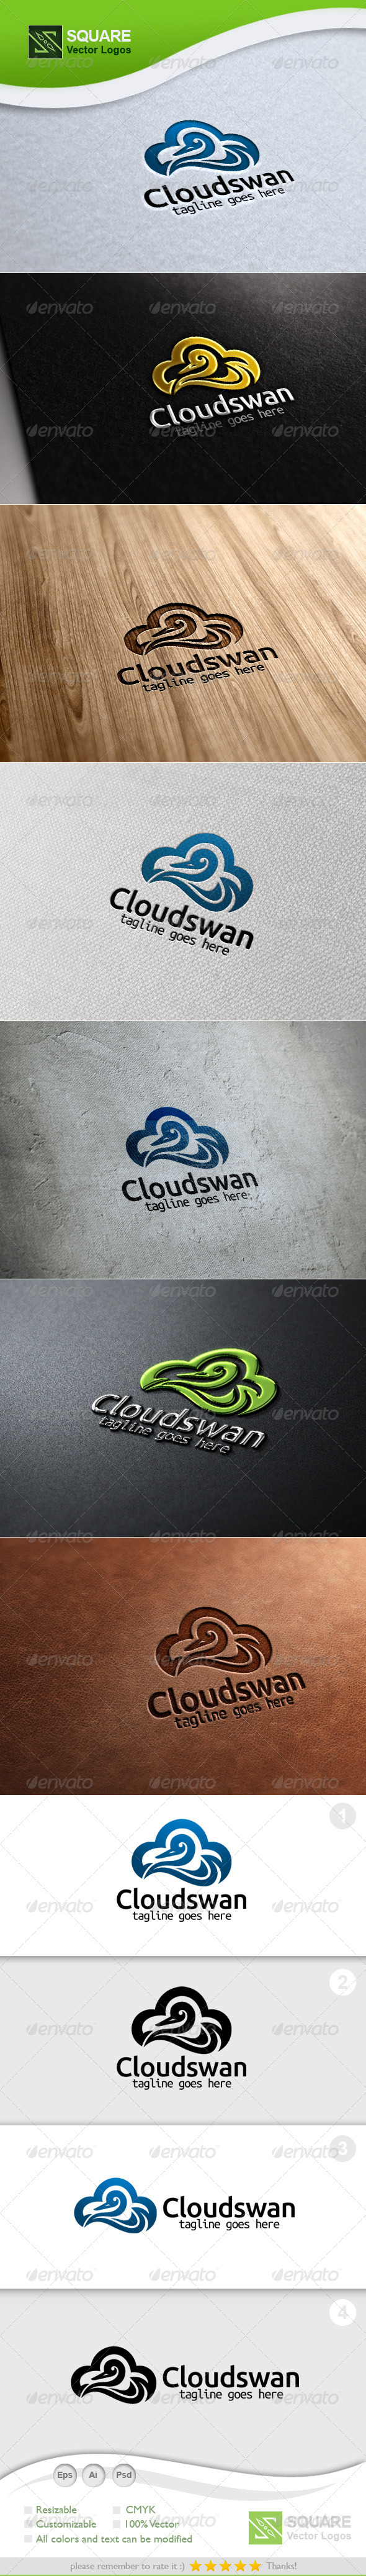 Cloud, Swan Vector Logo Template - Animals Logo Templates